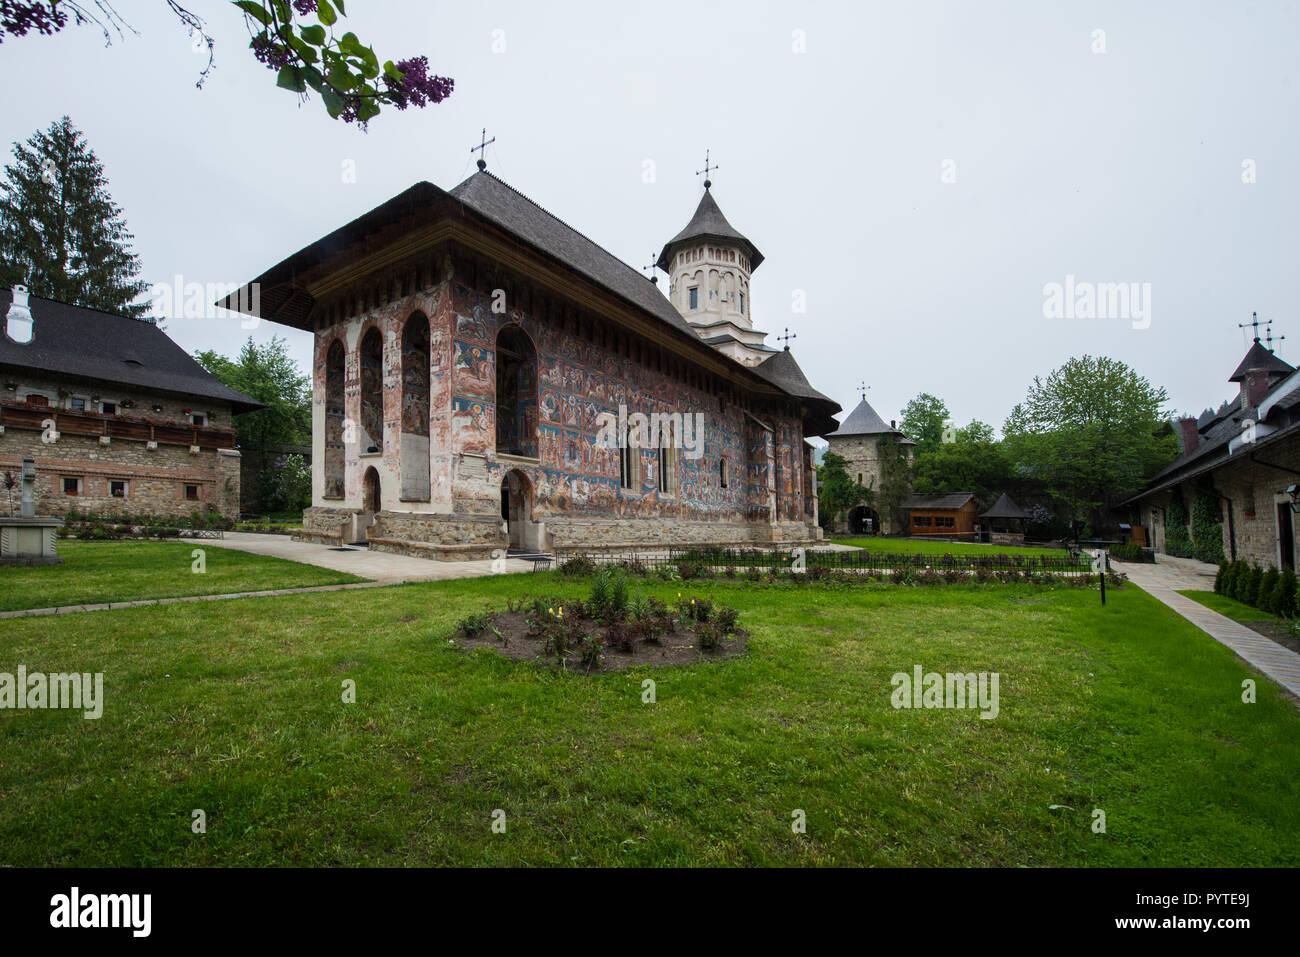 ROMANIA, MOLDOVITA. The monastery belongs to the famous painted churches of Romania - Stock Image